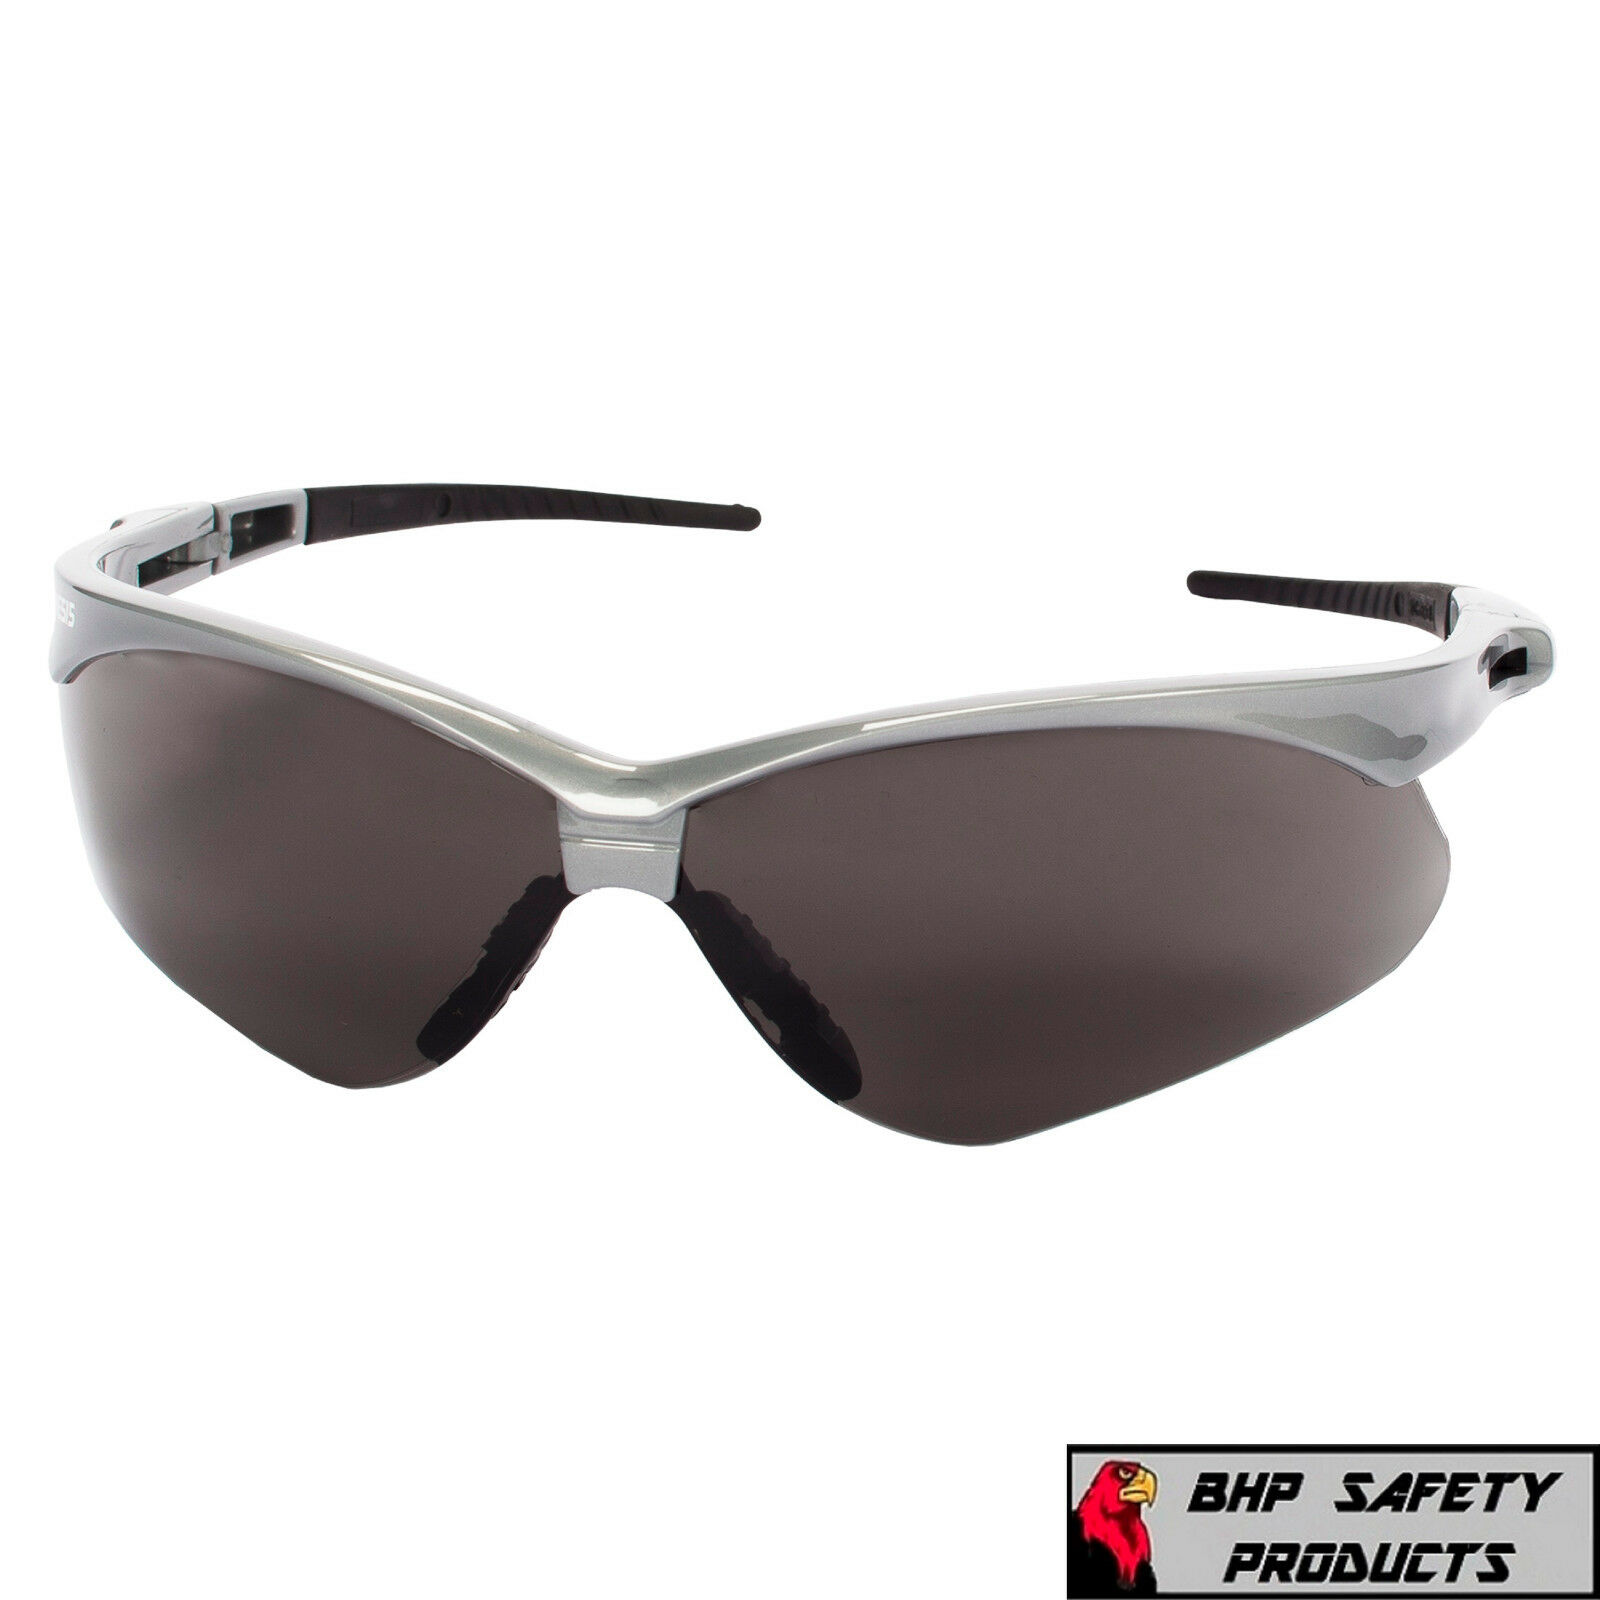 JACKSON NEMESIS SAFETY GLASSES SUNGLASSES SPORT WORK EYEWEAR - VARIETY PACKS 47383- Silver Frame/Smoke AF Lens